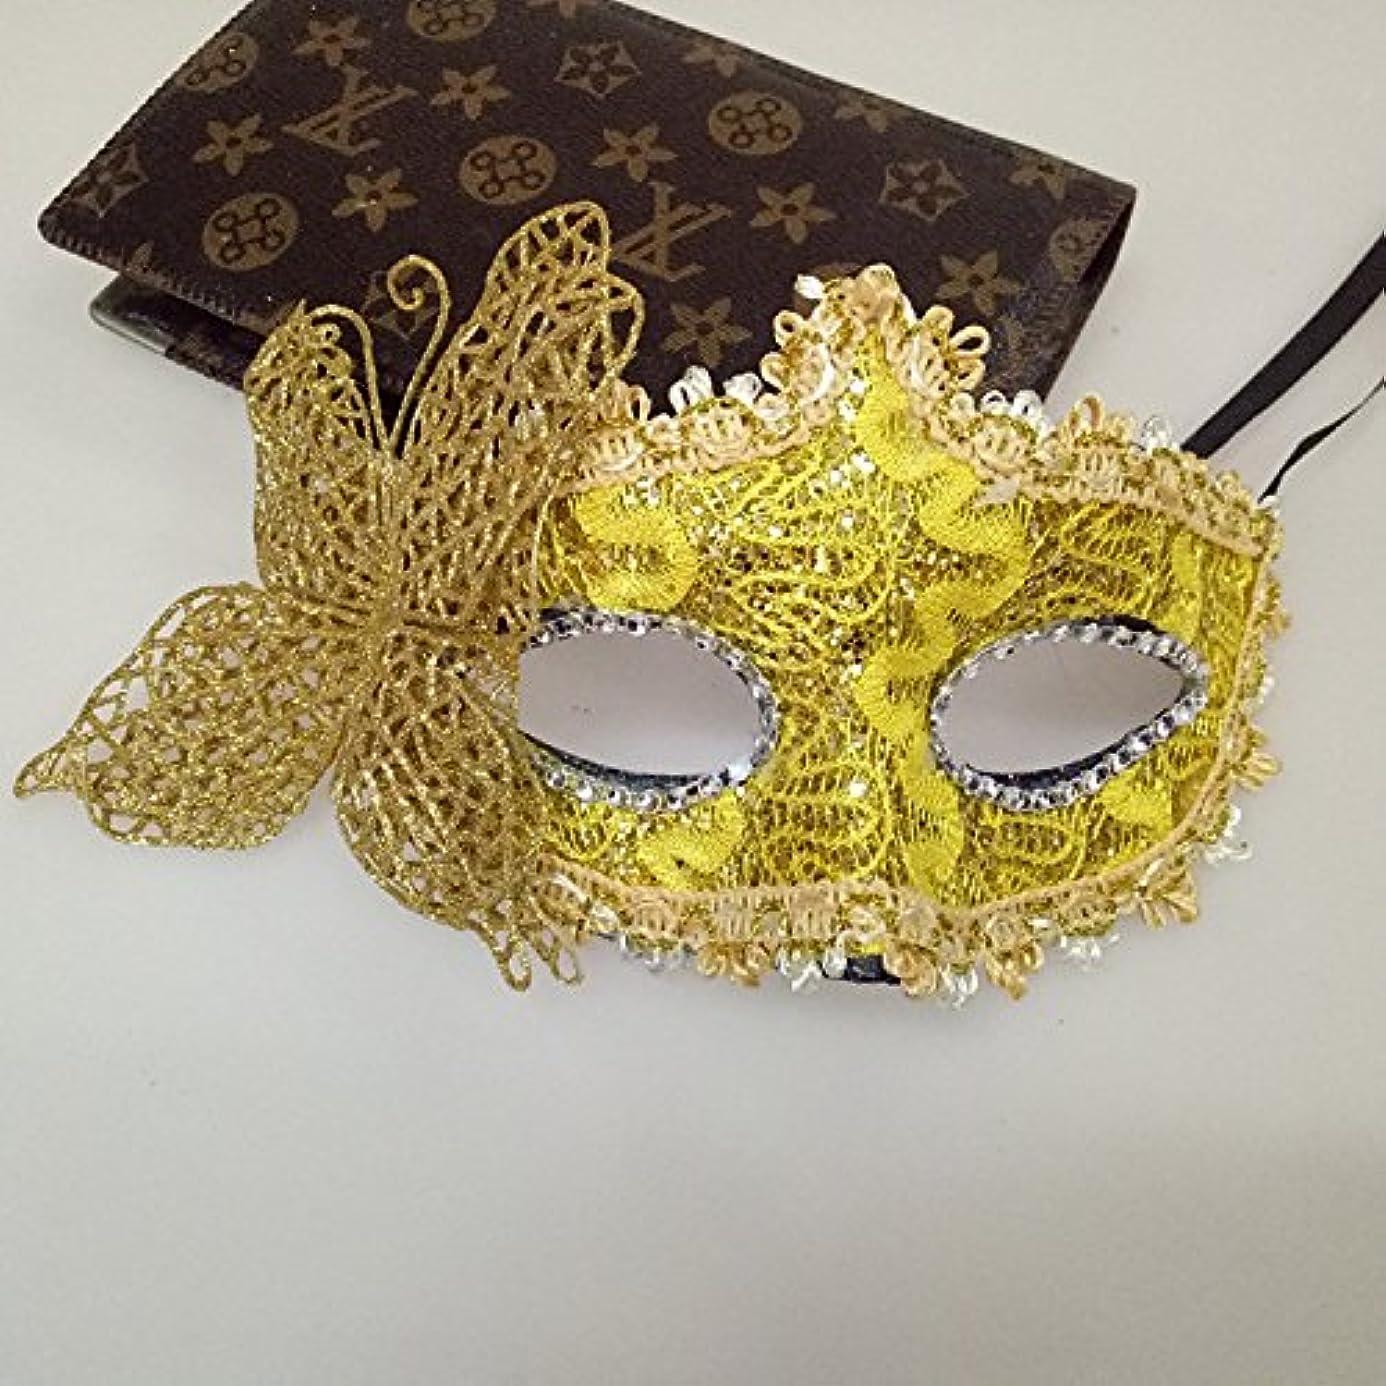 KELER Butterfly Mask Venetian Princess Masquerade Mask Costume Party Half-Face Mask (Yellow) bcf6329690